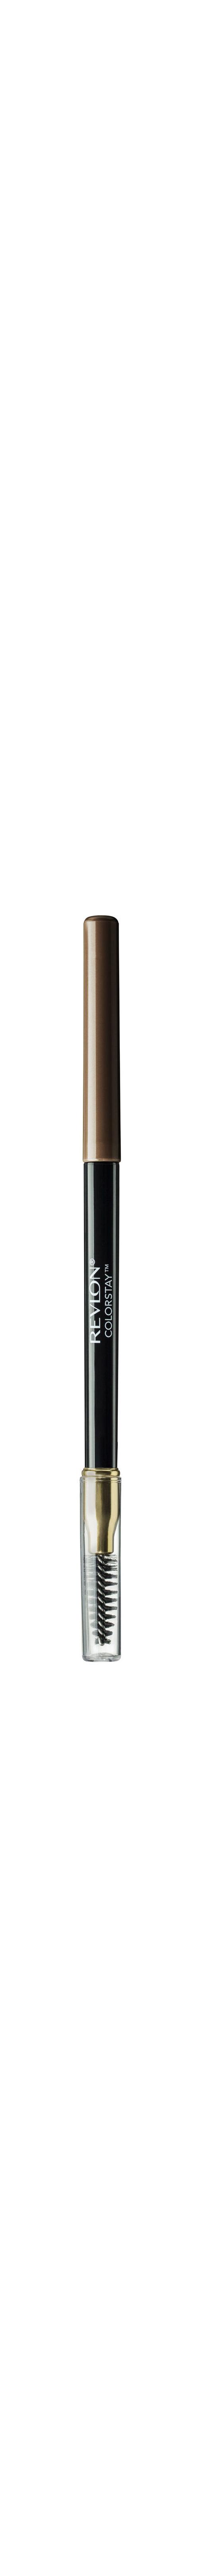 Revlon Colorstay™ Brown Pencil Soft Brown